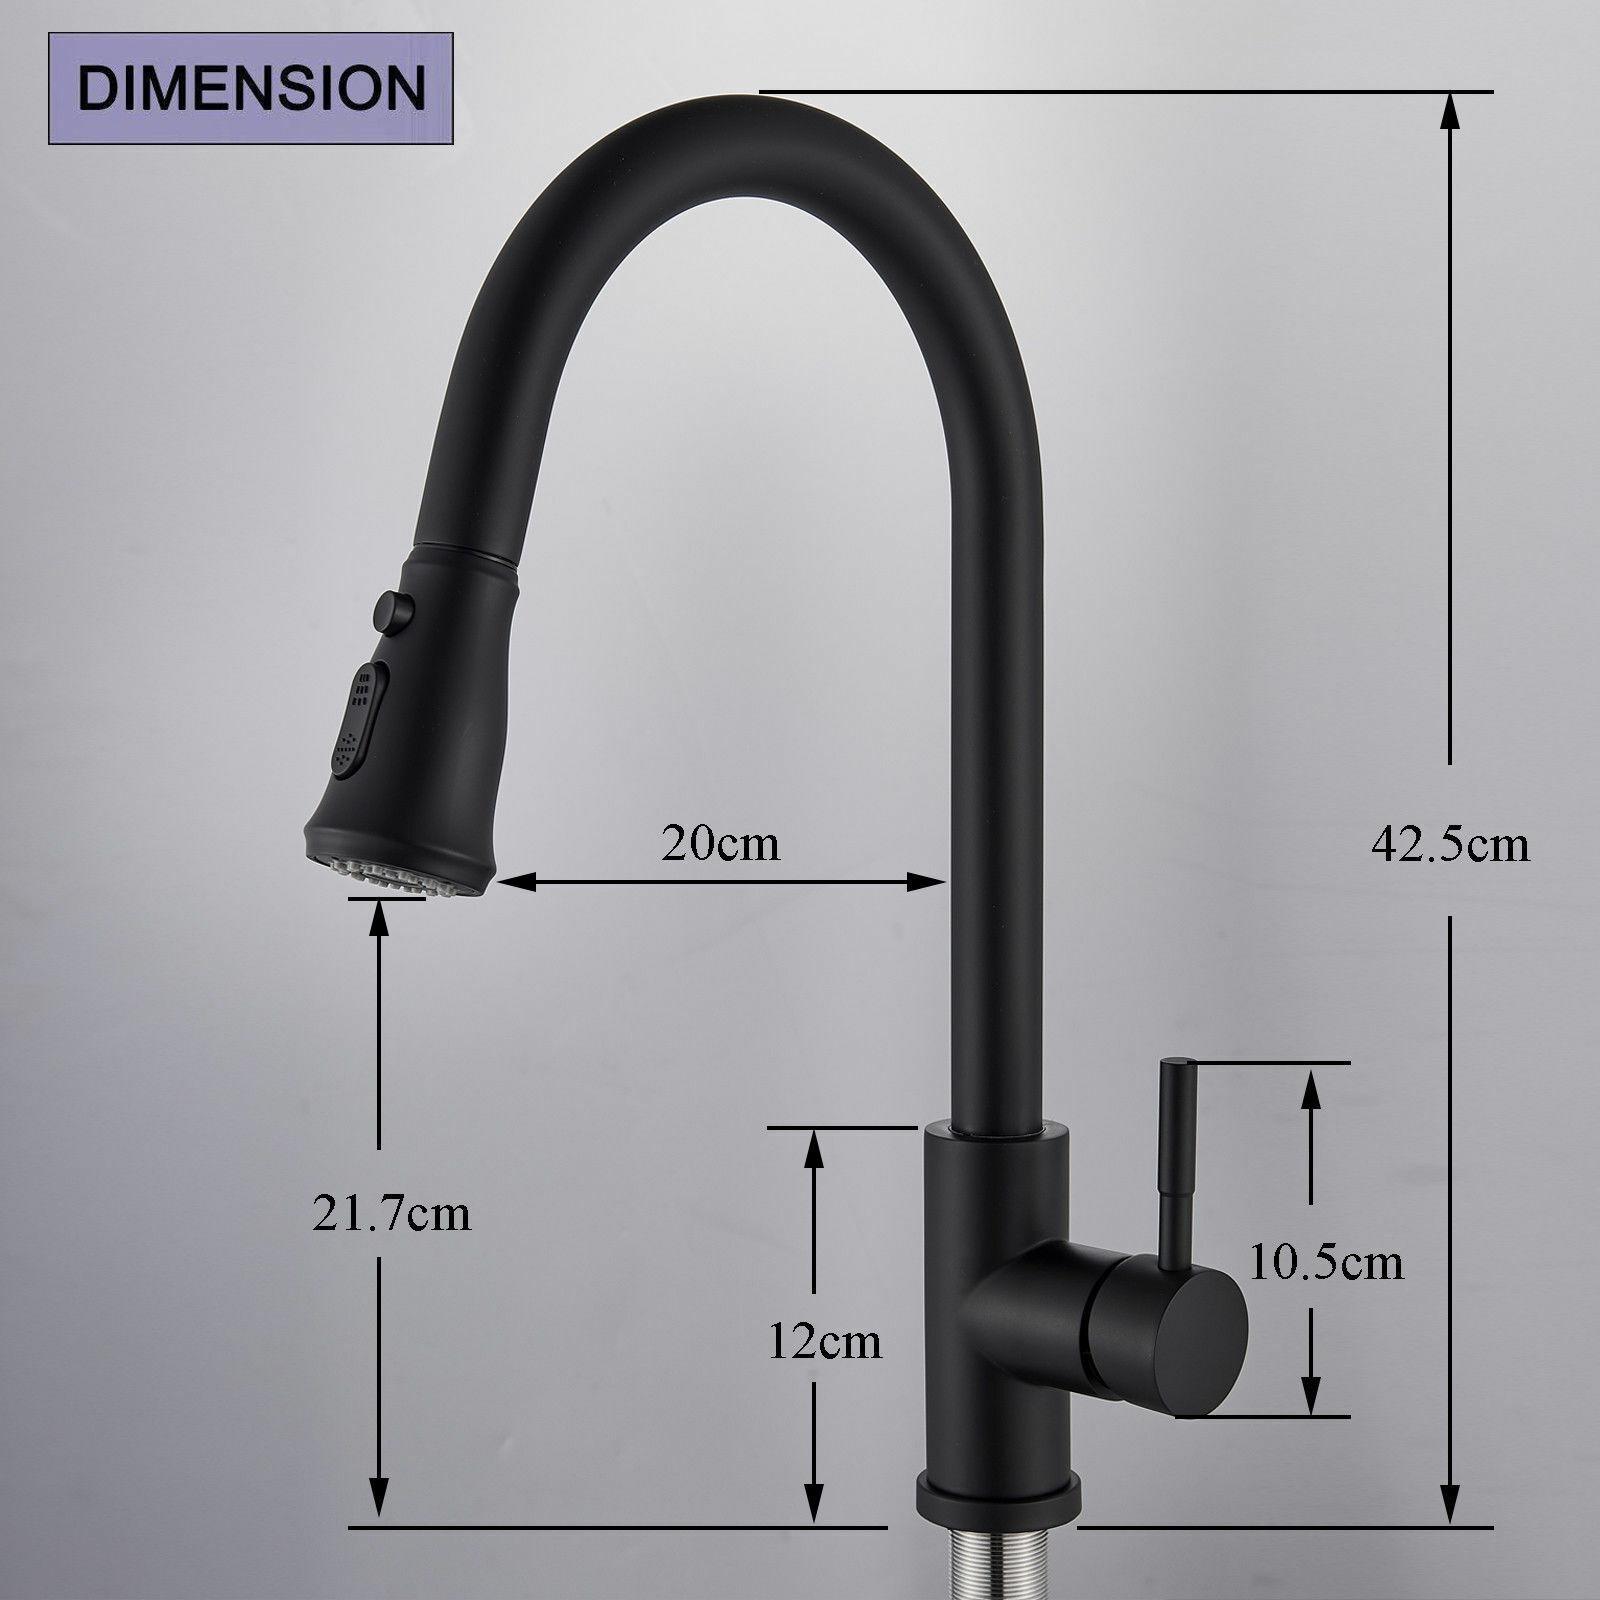 Kitchen Faucet Black Pull Down Sprayer Head 3 Holes Sink Taps W/soap dispenser 10